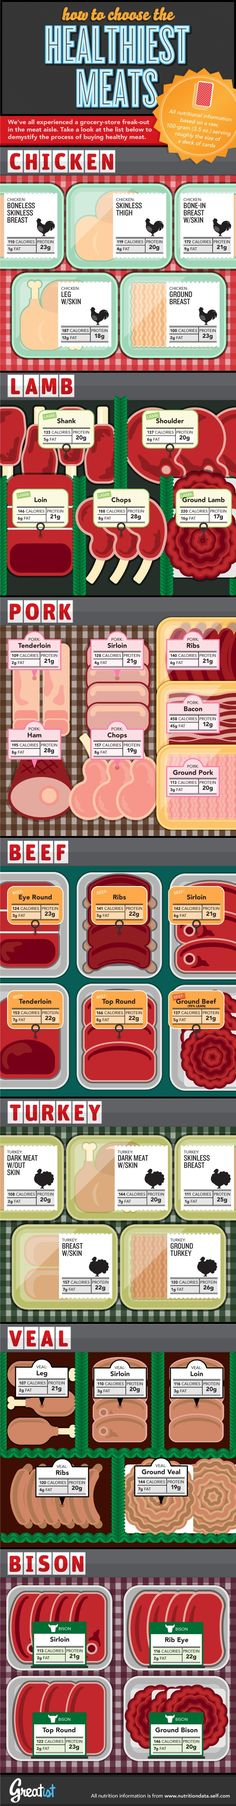 Fat Free Eats: Nutrition Comparison Of Meat